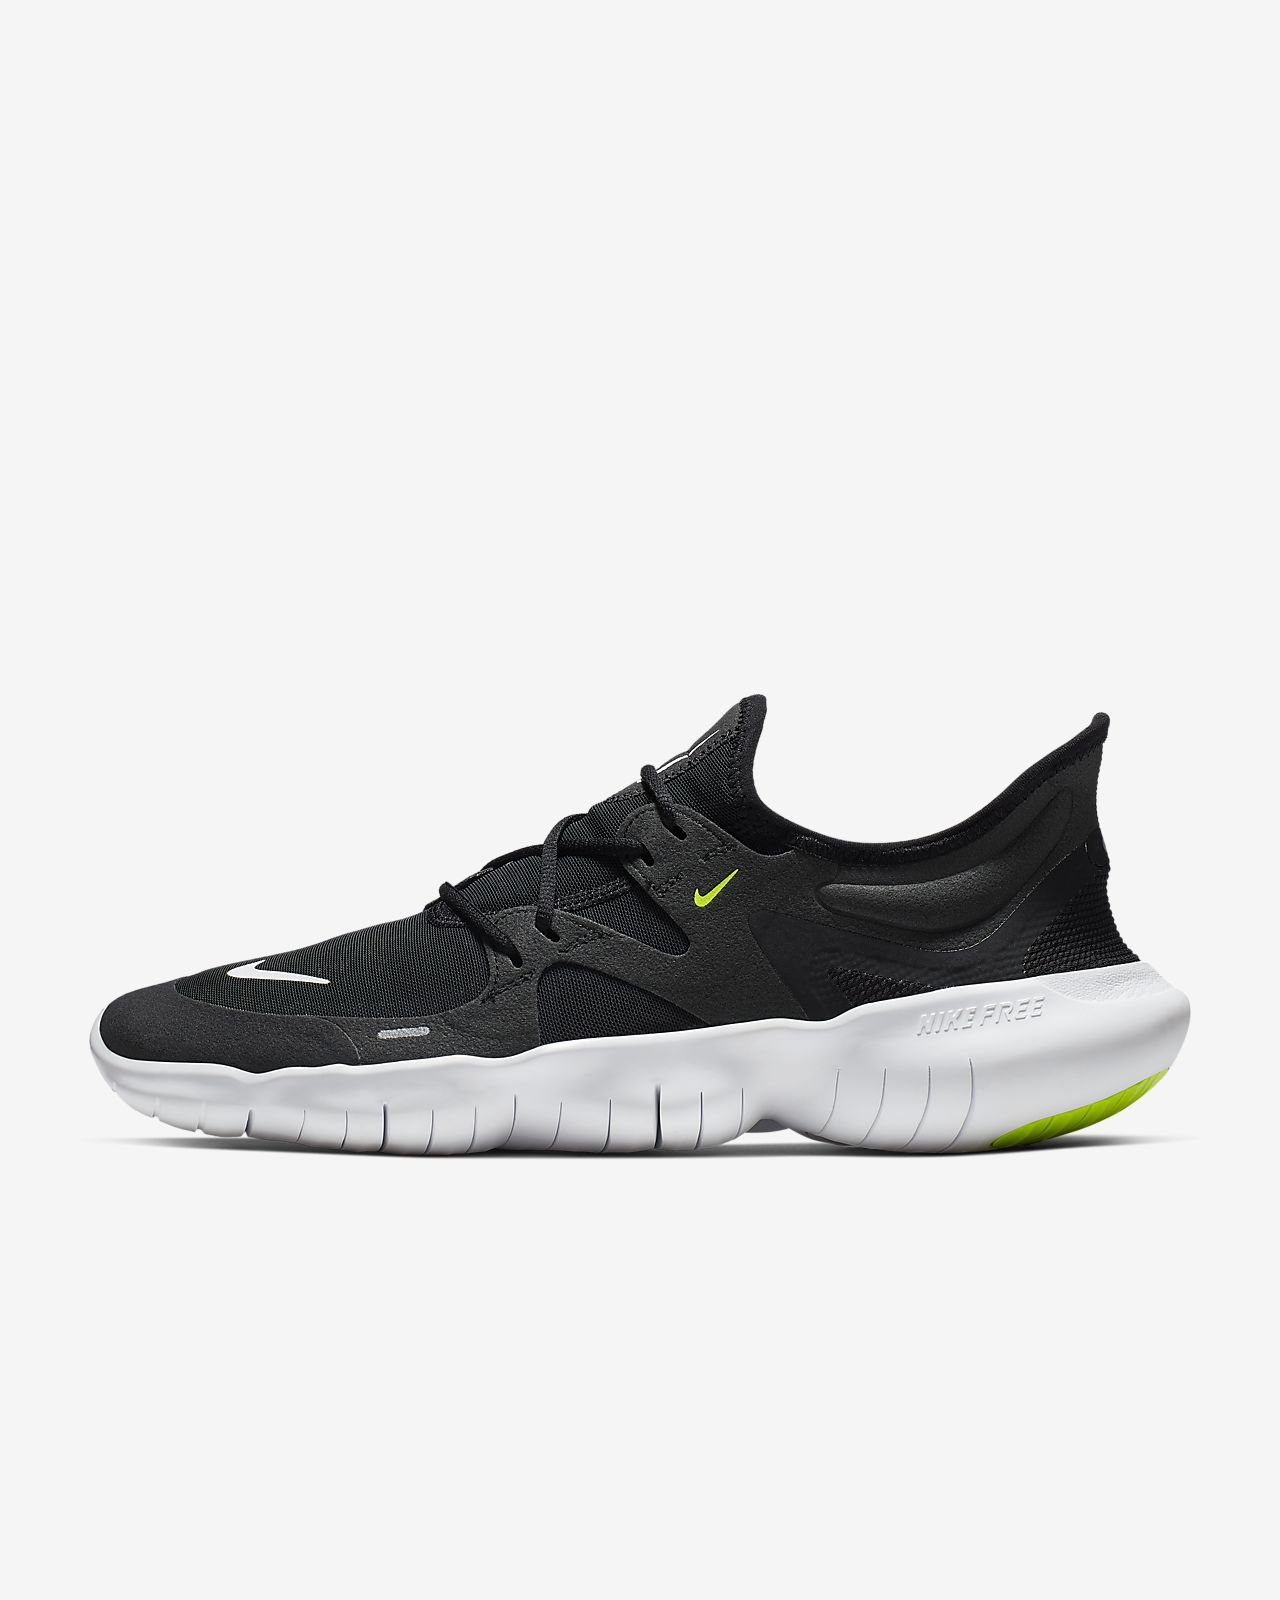 buy online cb16c 135f2 Men s Running Shoe. Nike Free RN 5.0